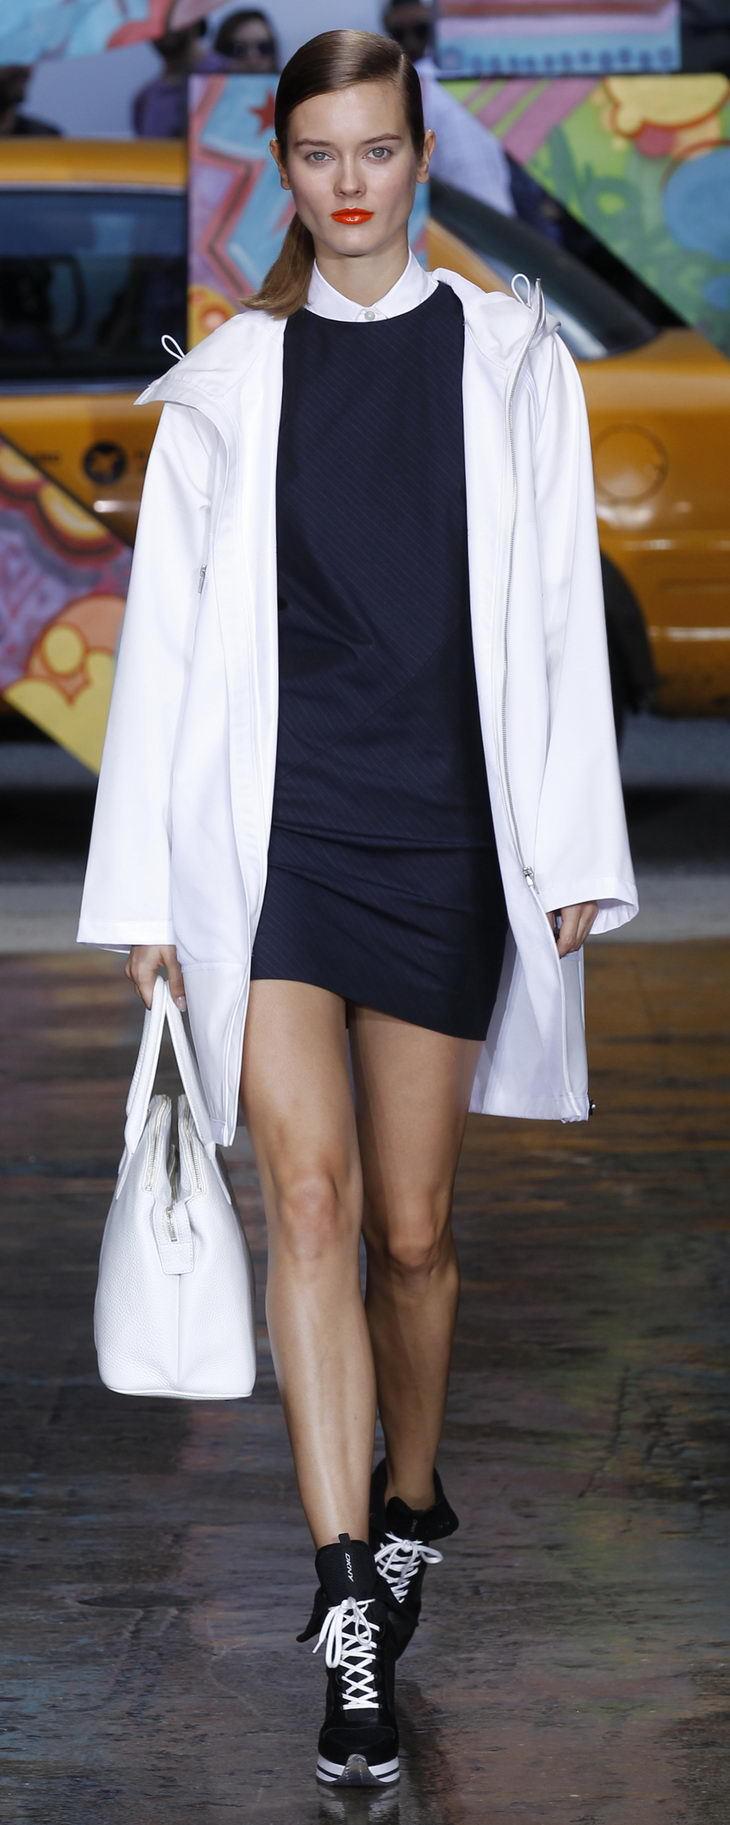 DKNY Spring Summer 2014 Womenswear Collection 时尚大片